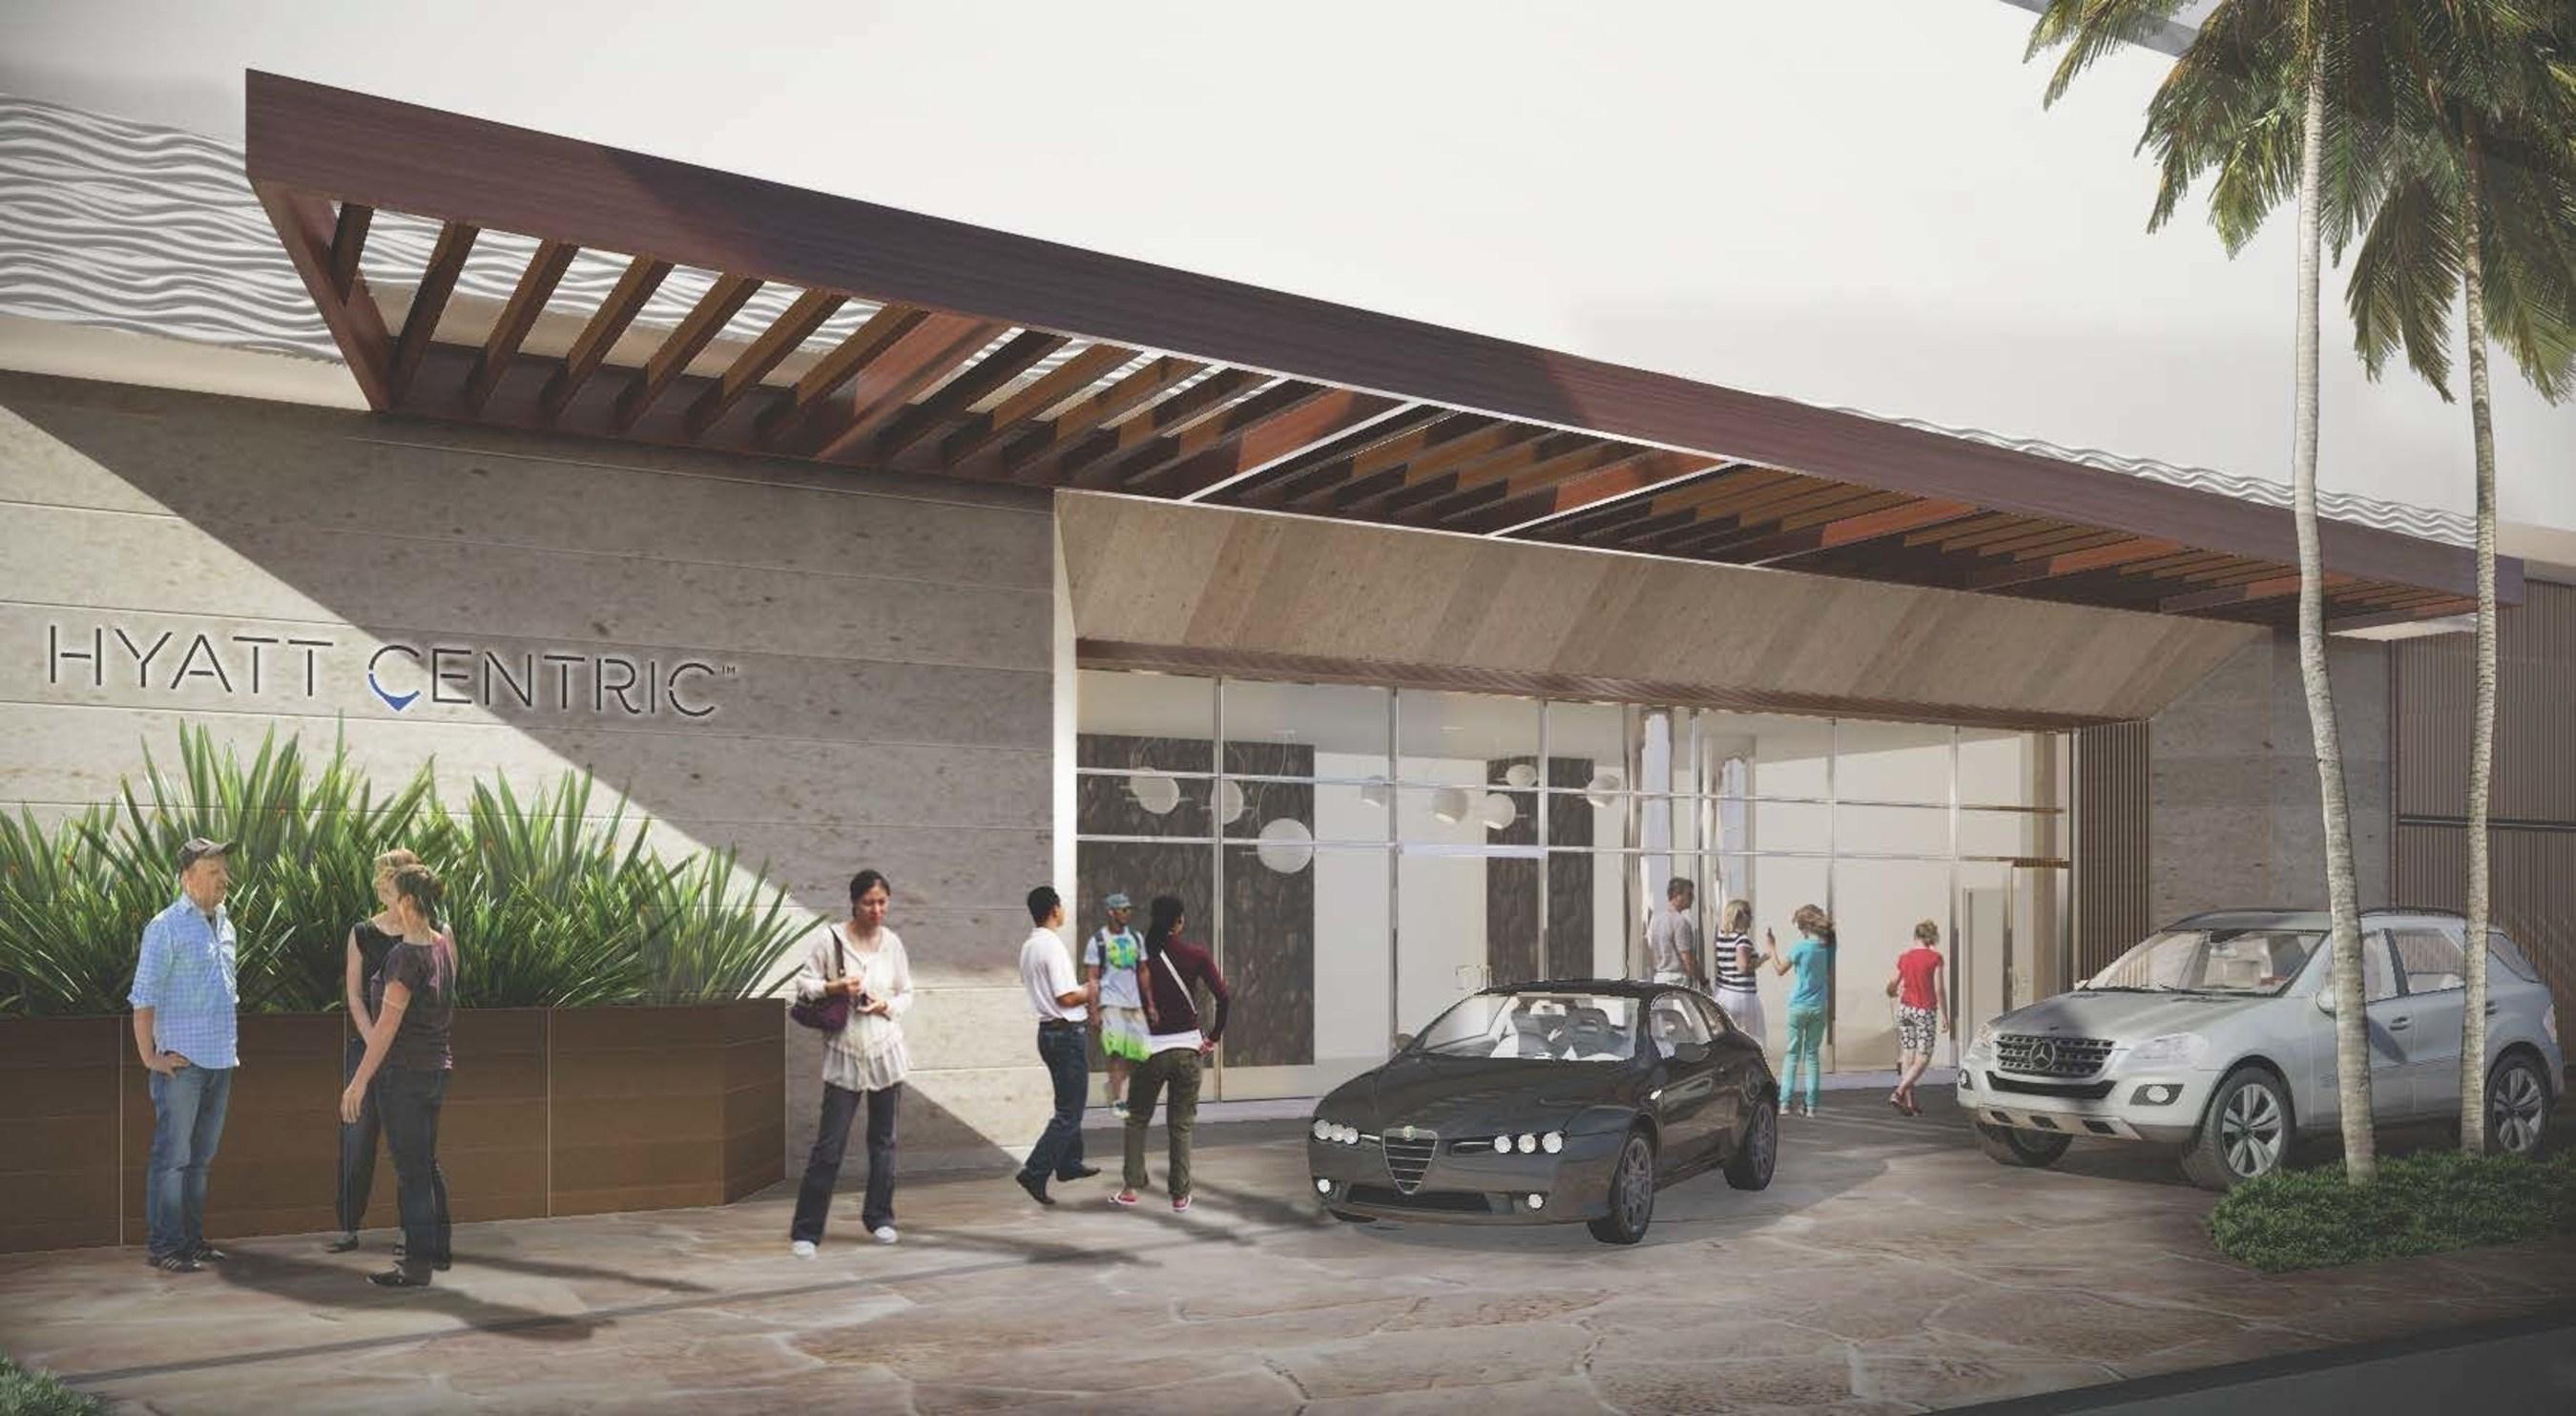 Hyatt Centric Waikīkī Beach lobby rendering